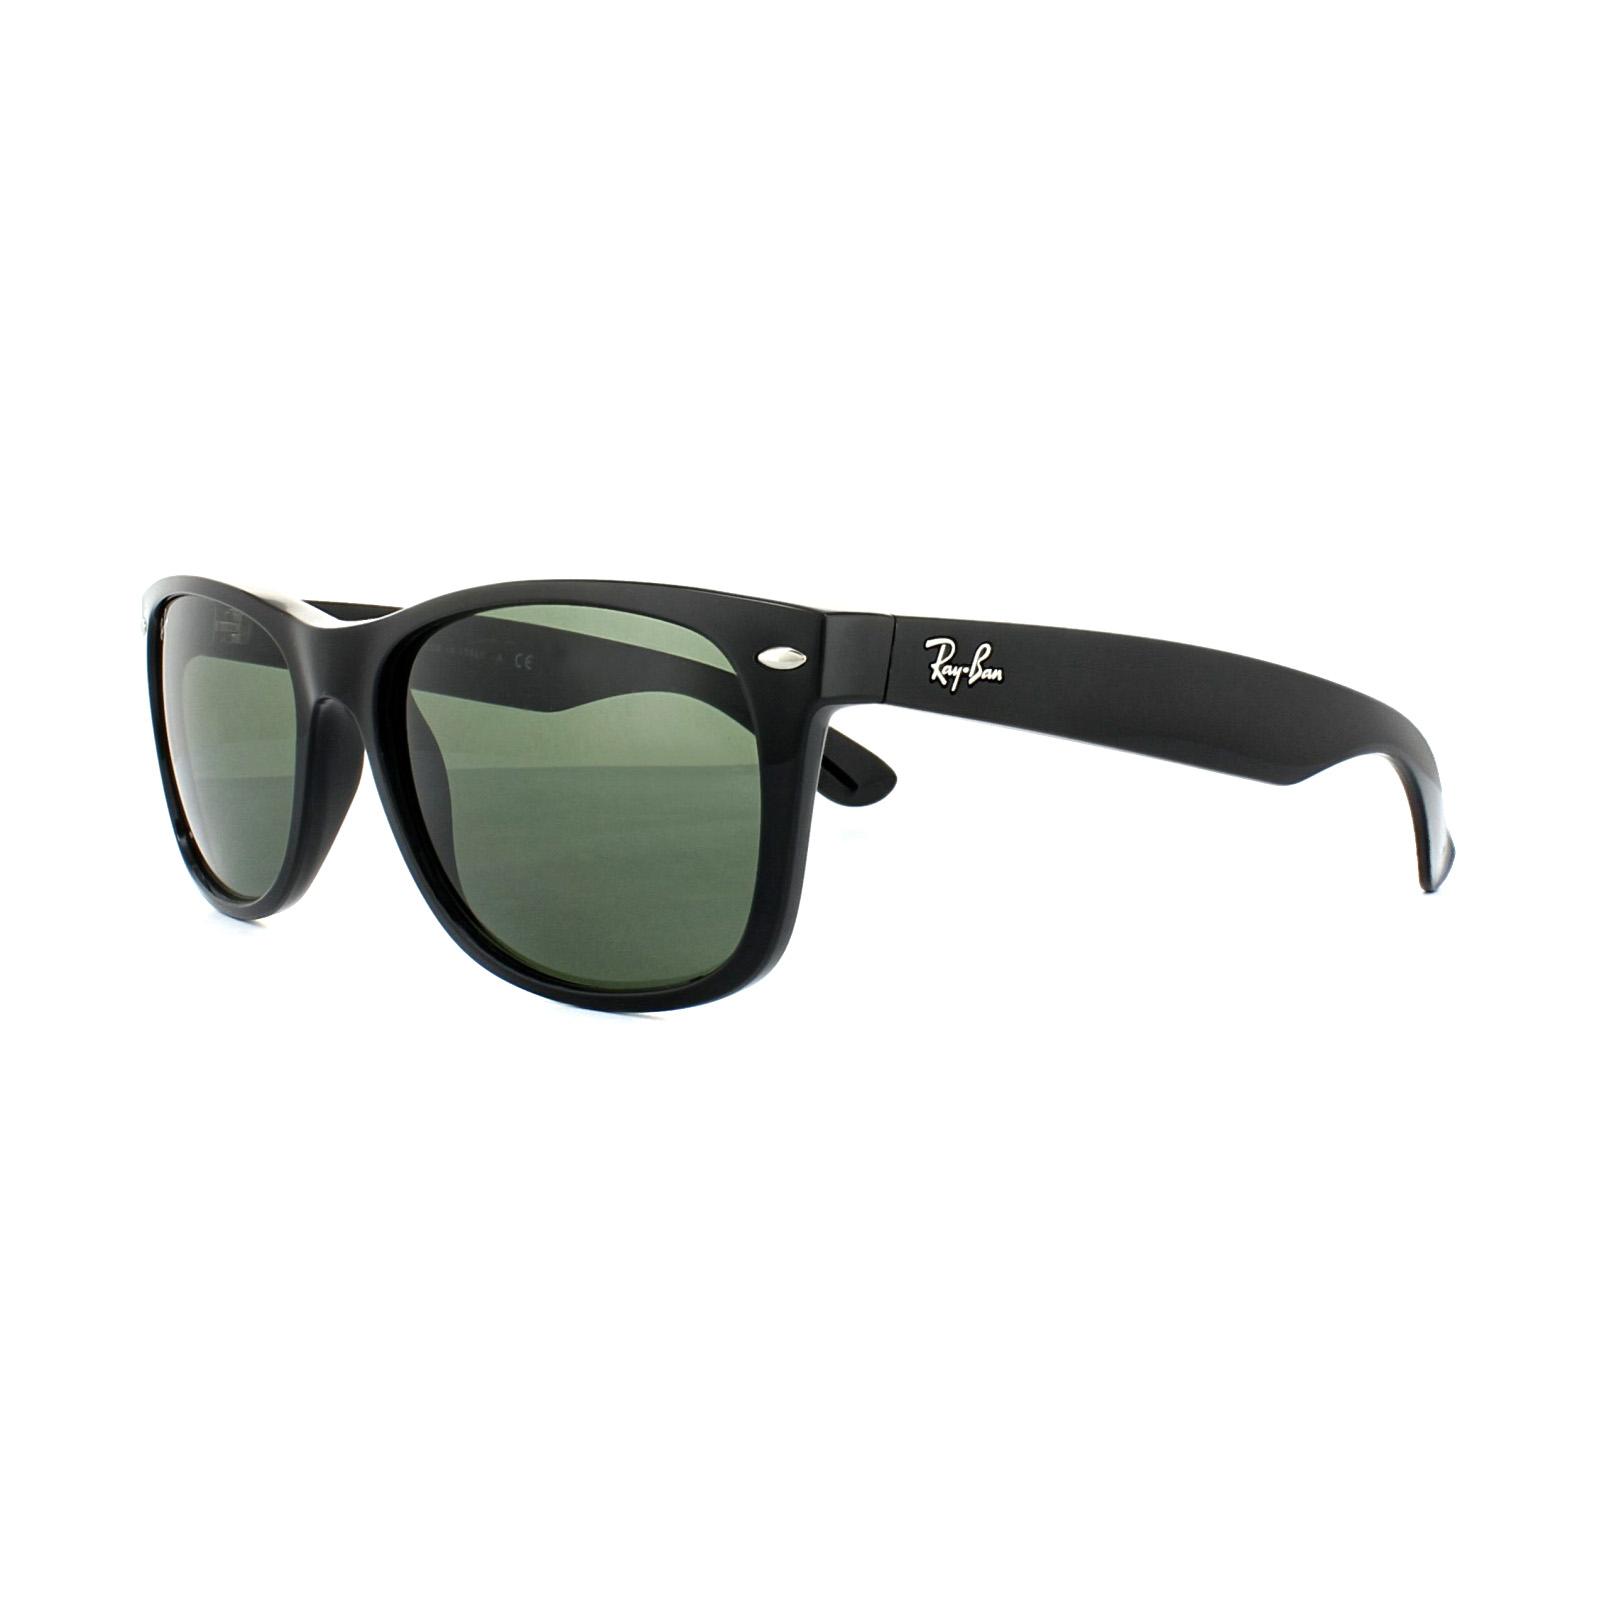 aa78559404 CENTINELA Gafas de sol de Ray-Ban New Wayfarer 2132 901 lustre negro G-15